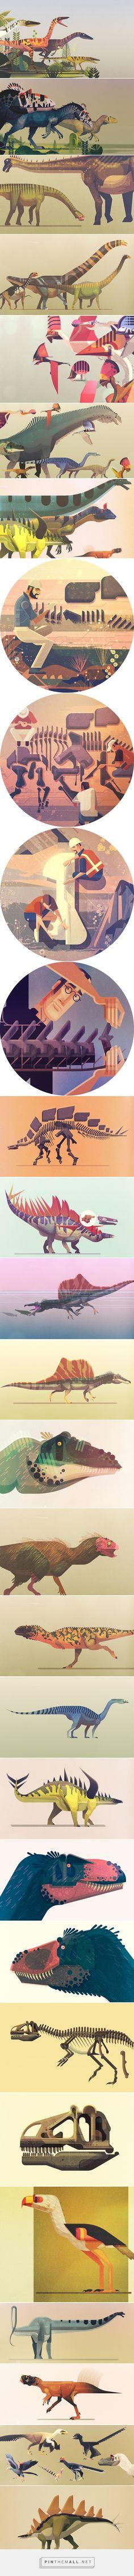 Lonely Planet Dinosaur Atlas on Behance